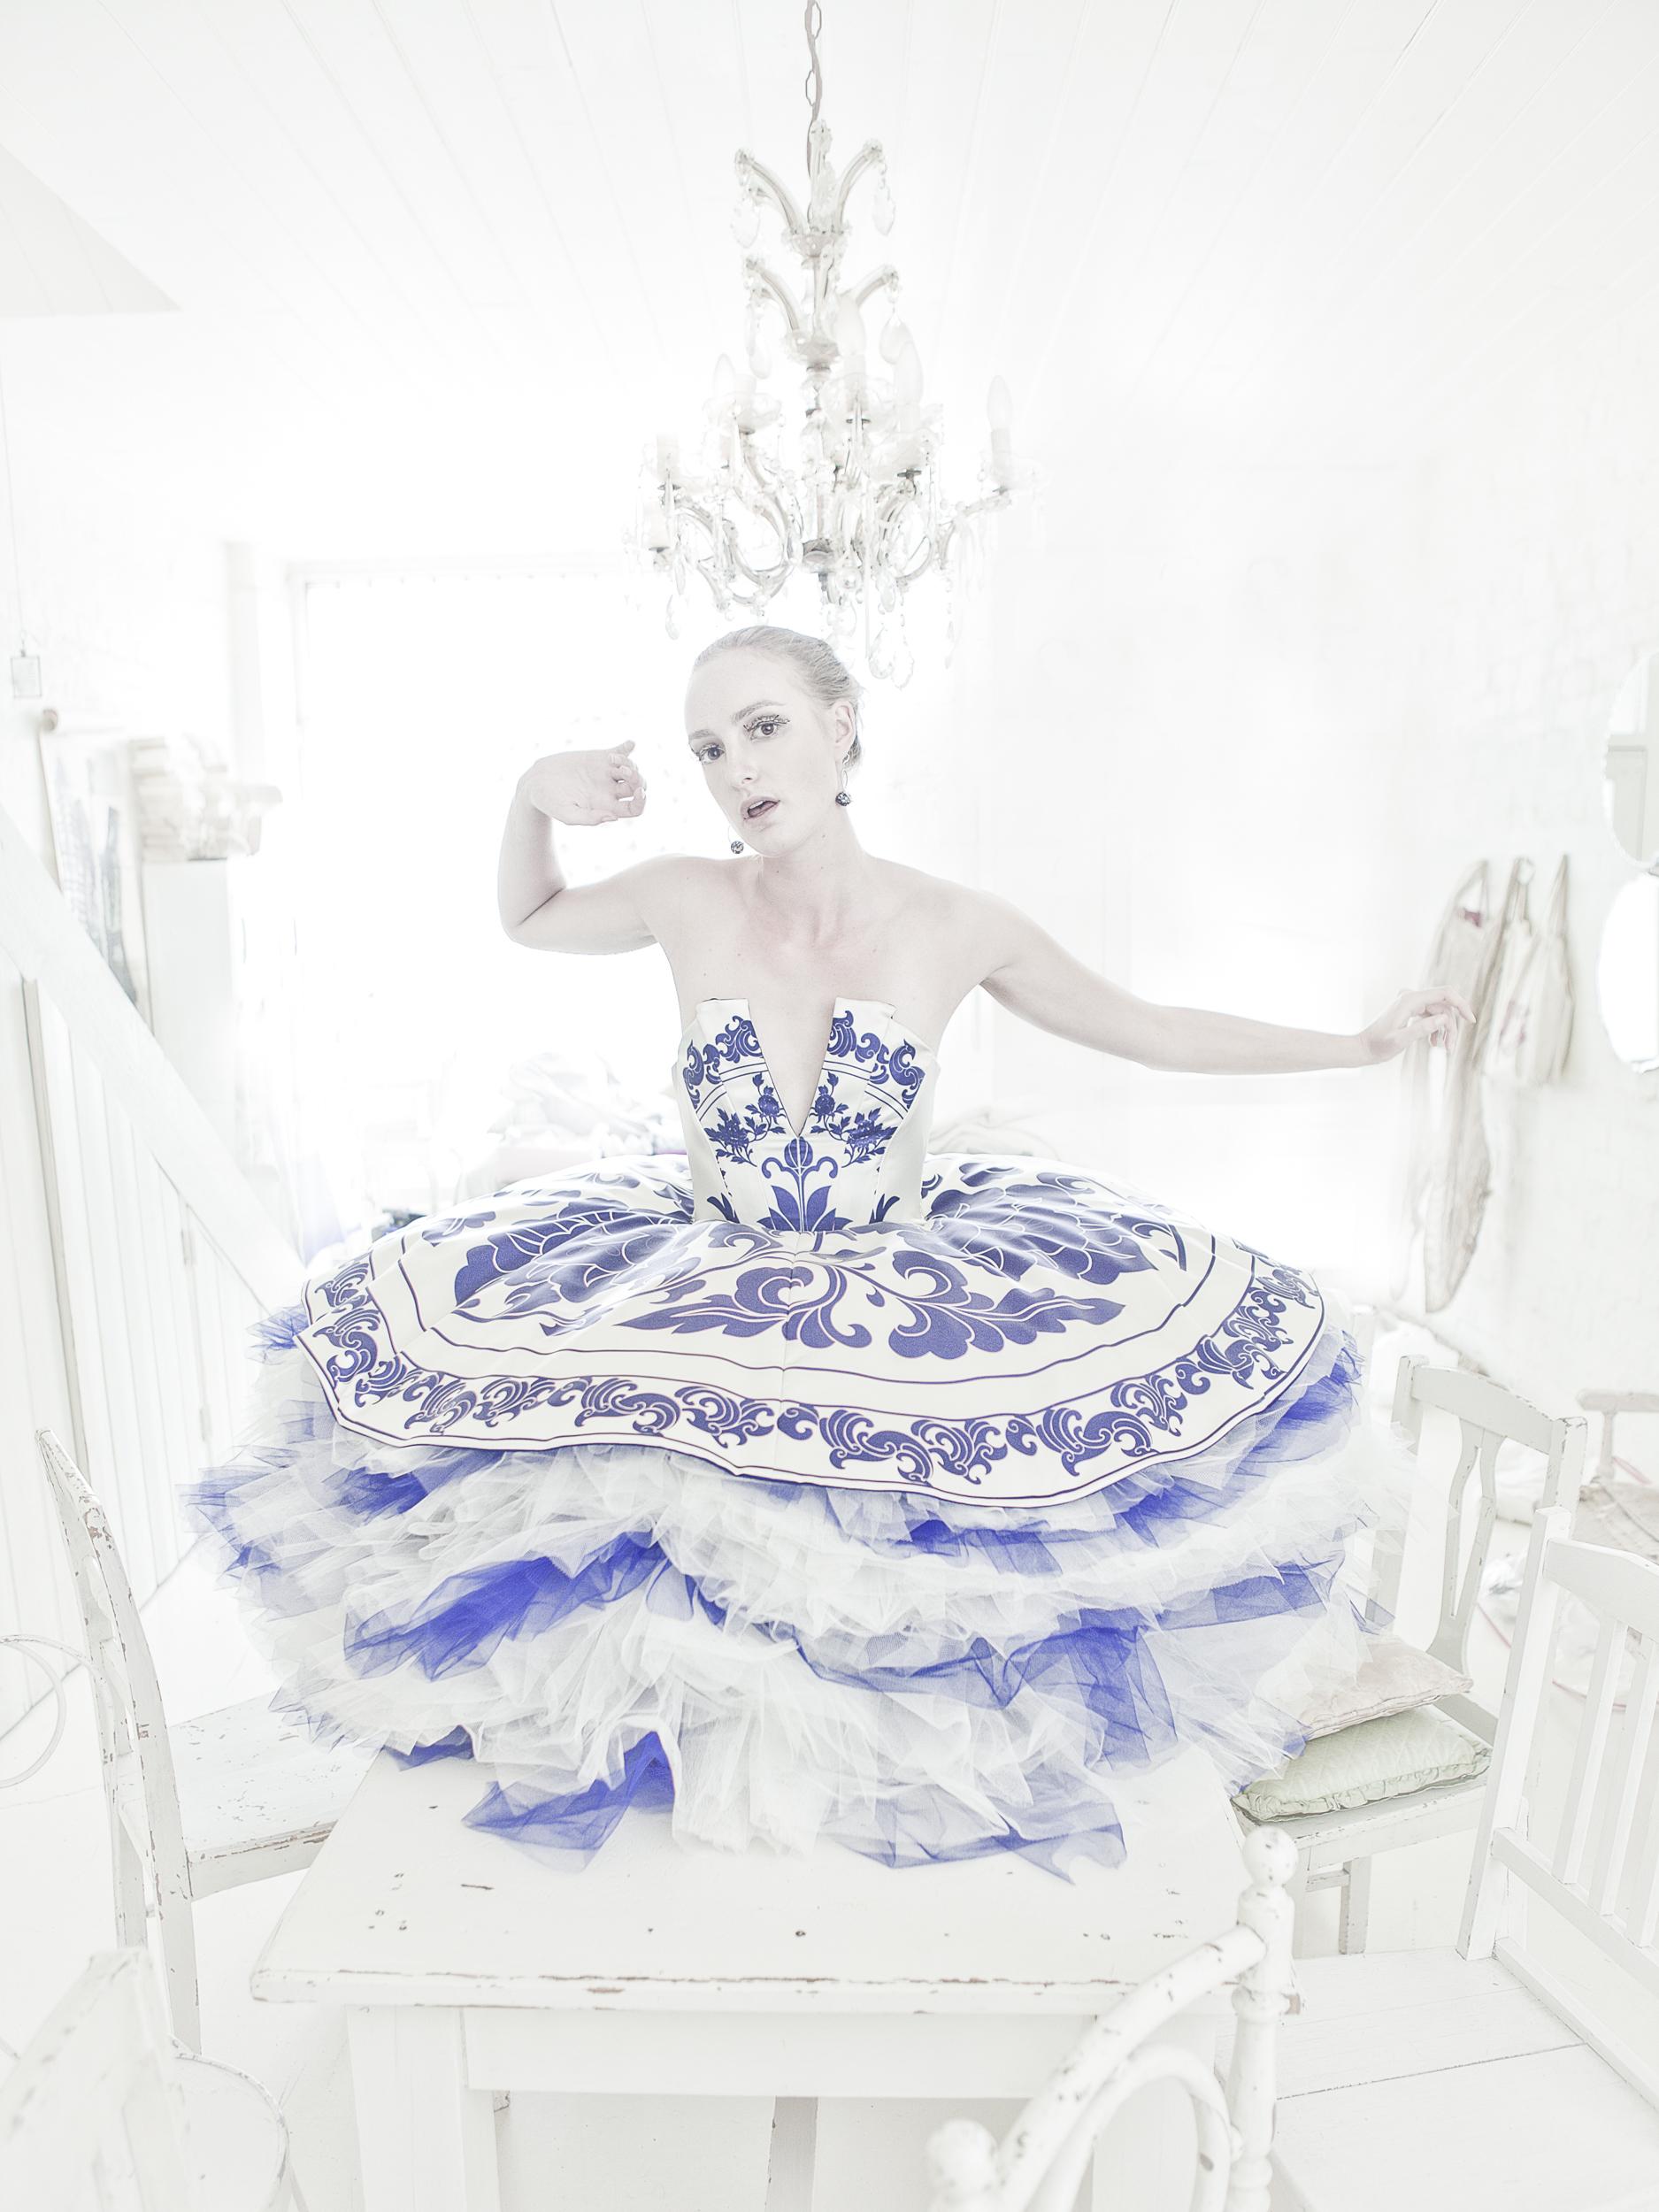 Vikk_Shayen_portfolio_cindyZ_porcelain_wear_9572-Edit.jpg